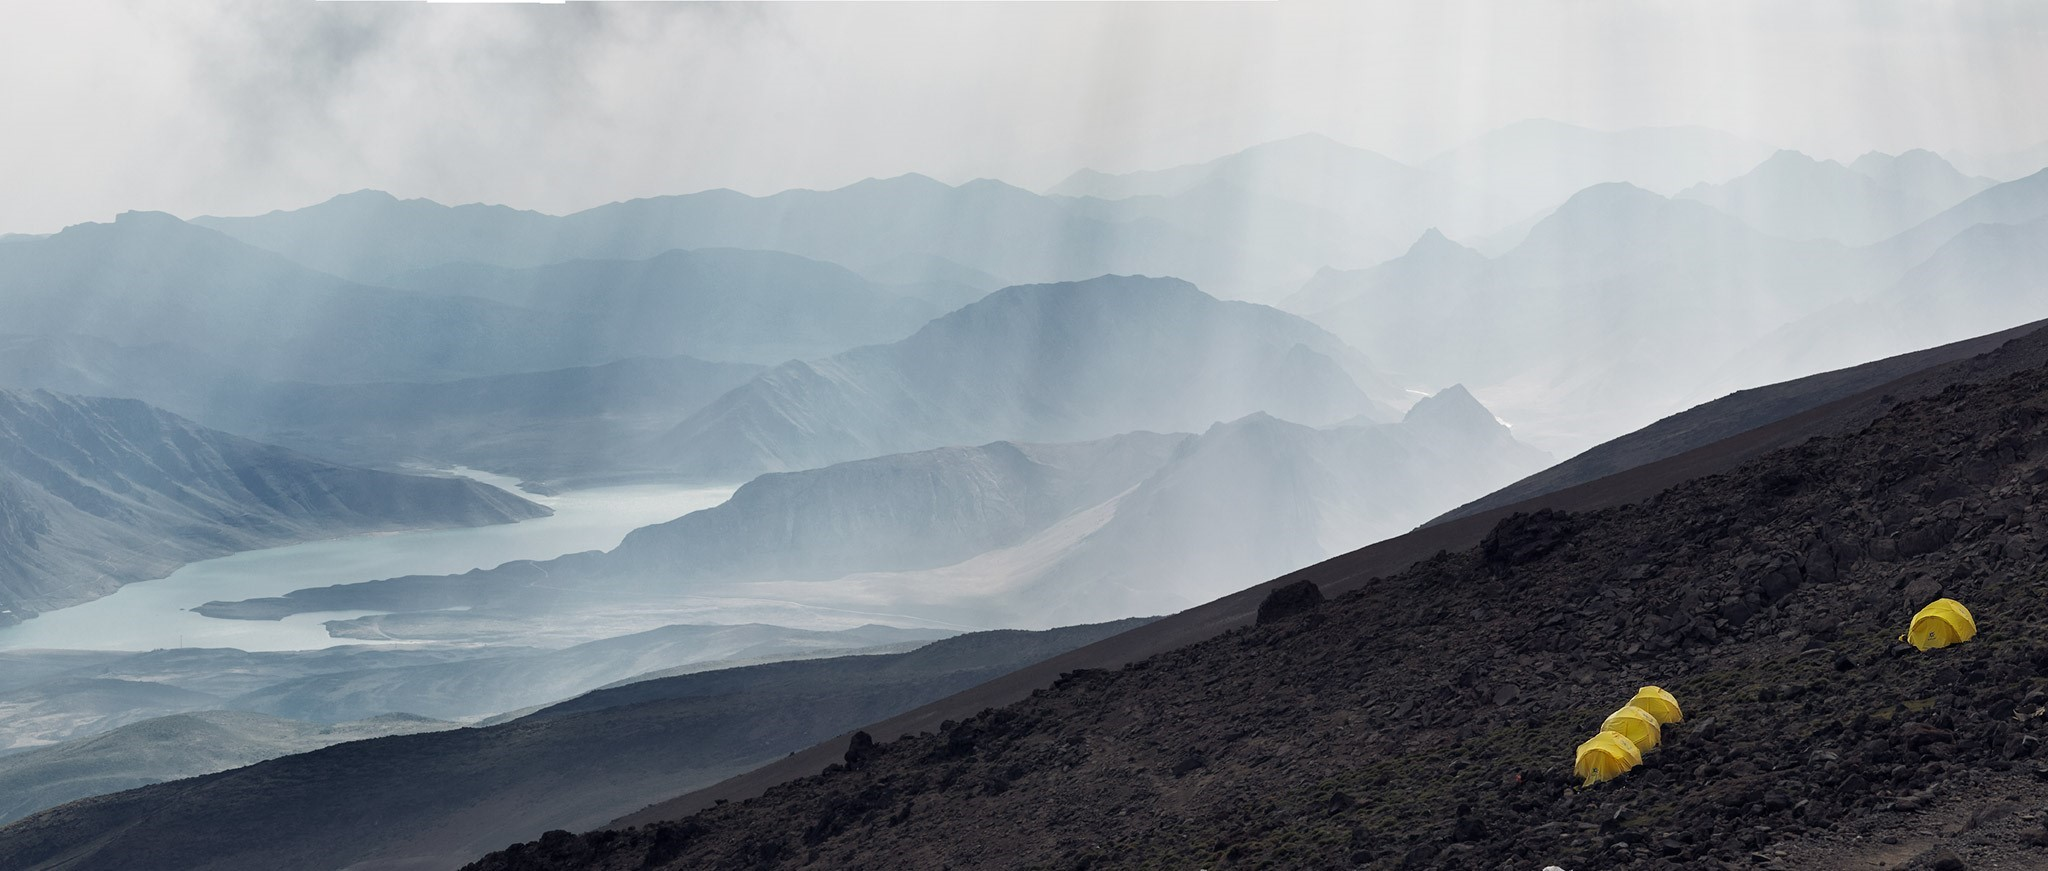 Lar Damn Lake as seen from Mt. Damavand Base Camp (4200m), Iran